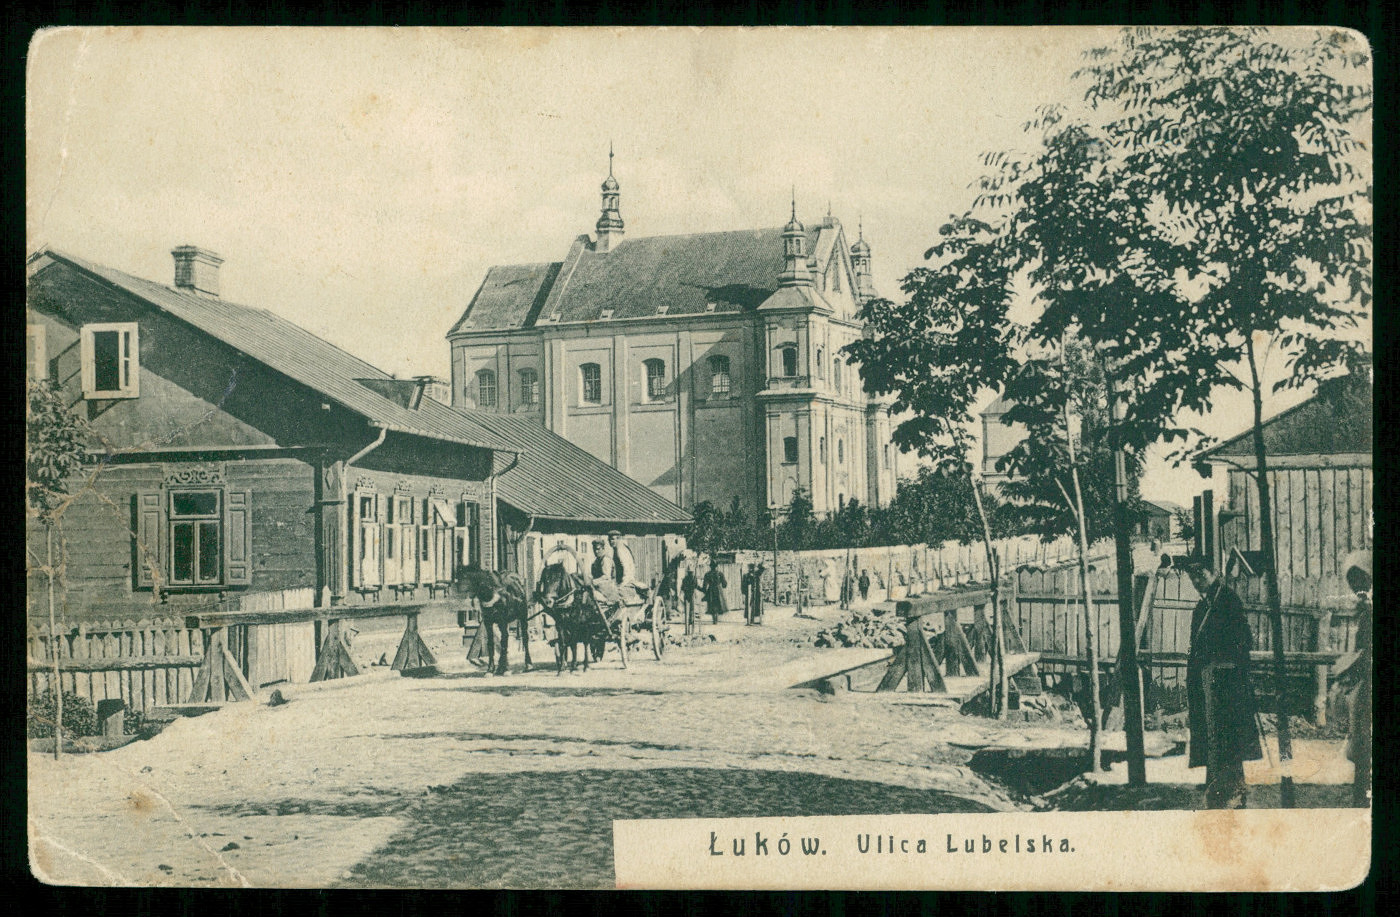 Łuków_1920_Polona_COMP.jpg [473.26 KB]